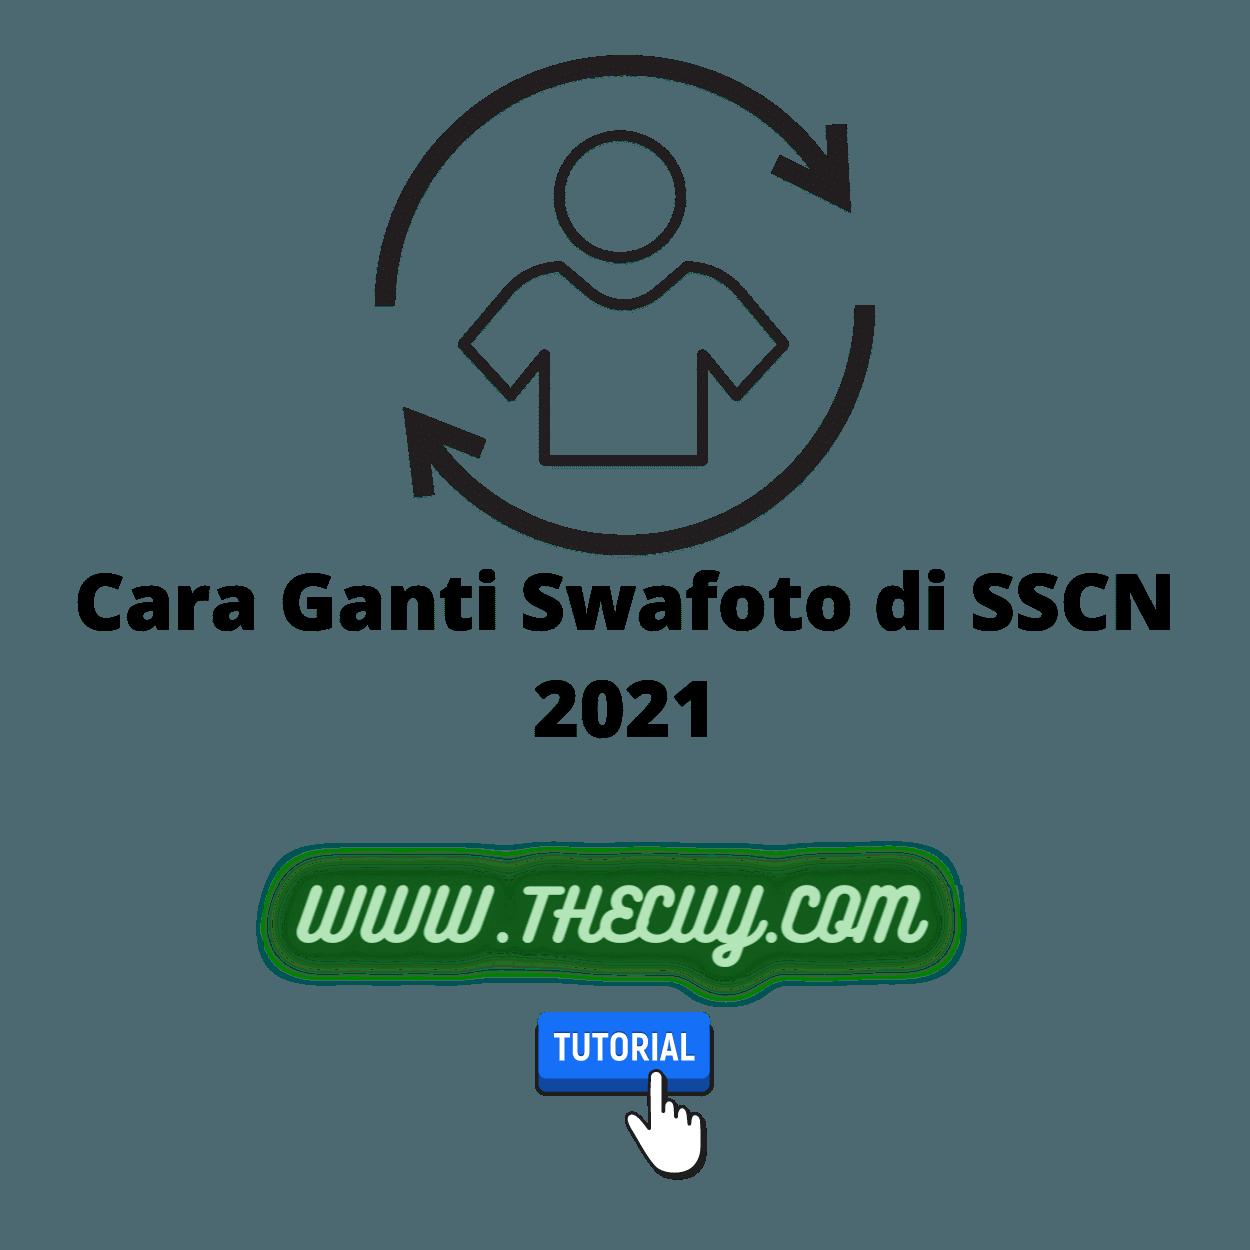 Cara Ganti Swafoto di SSCN 2021